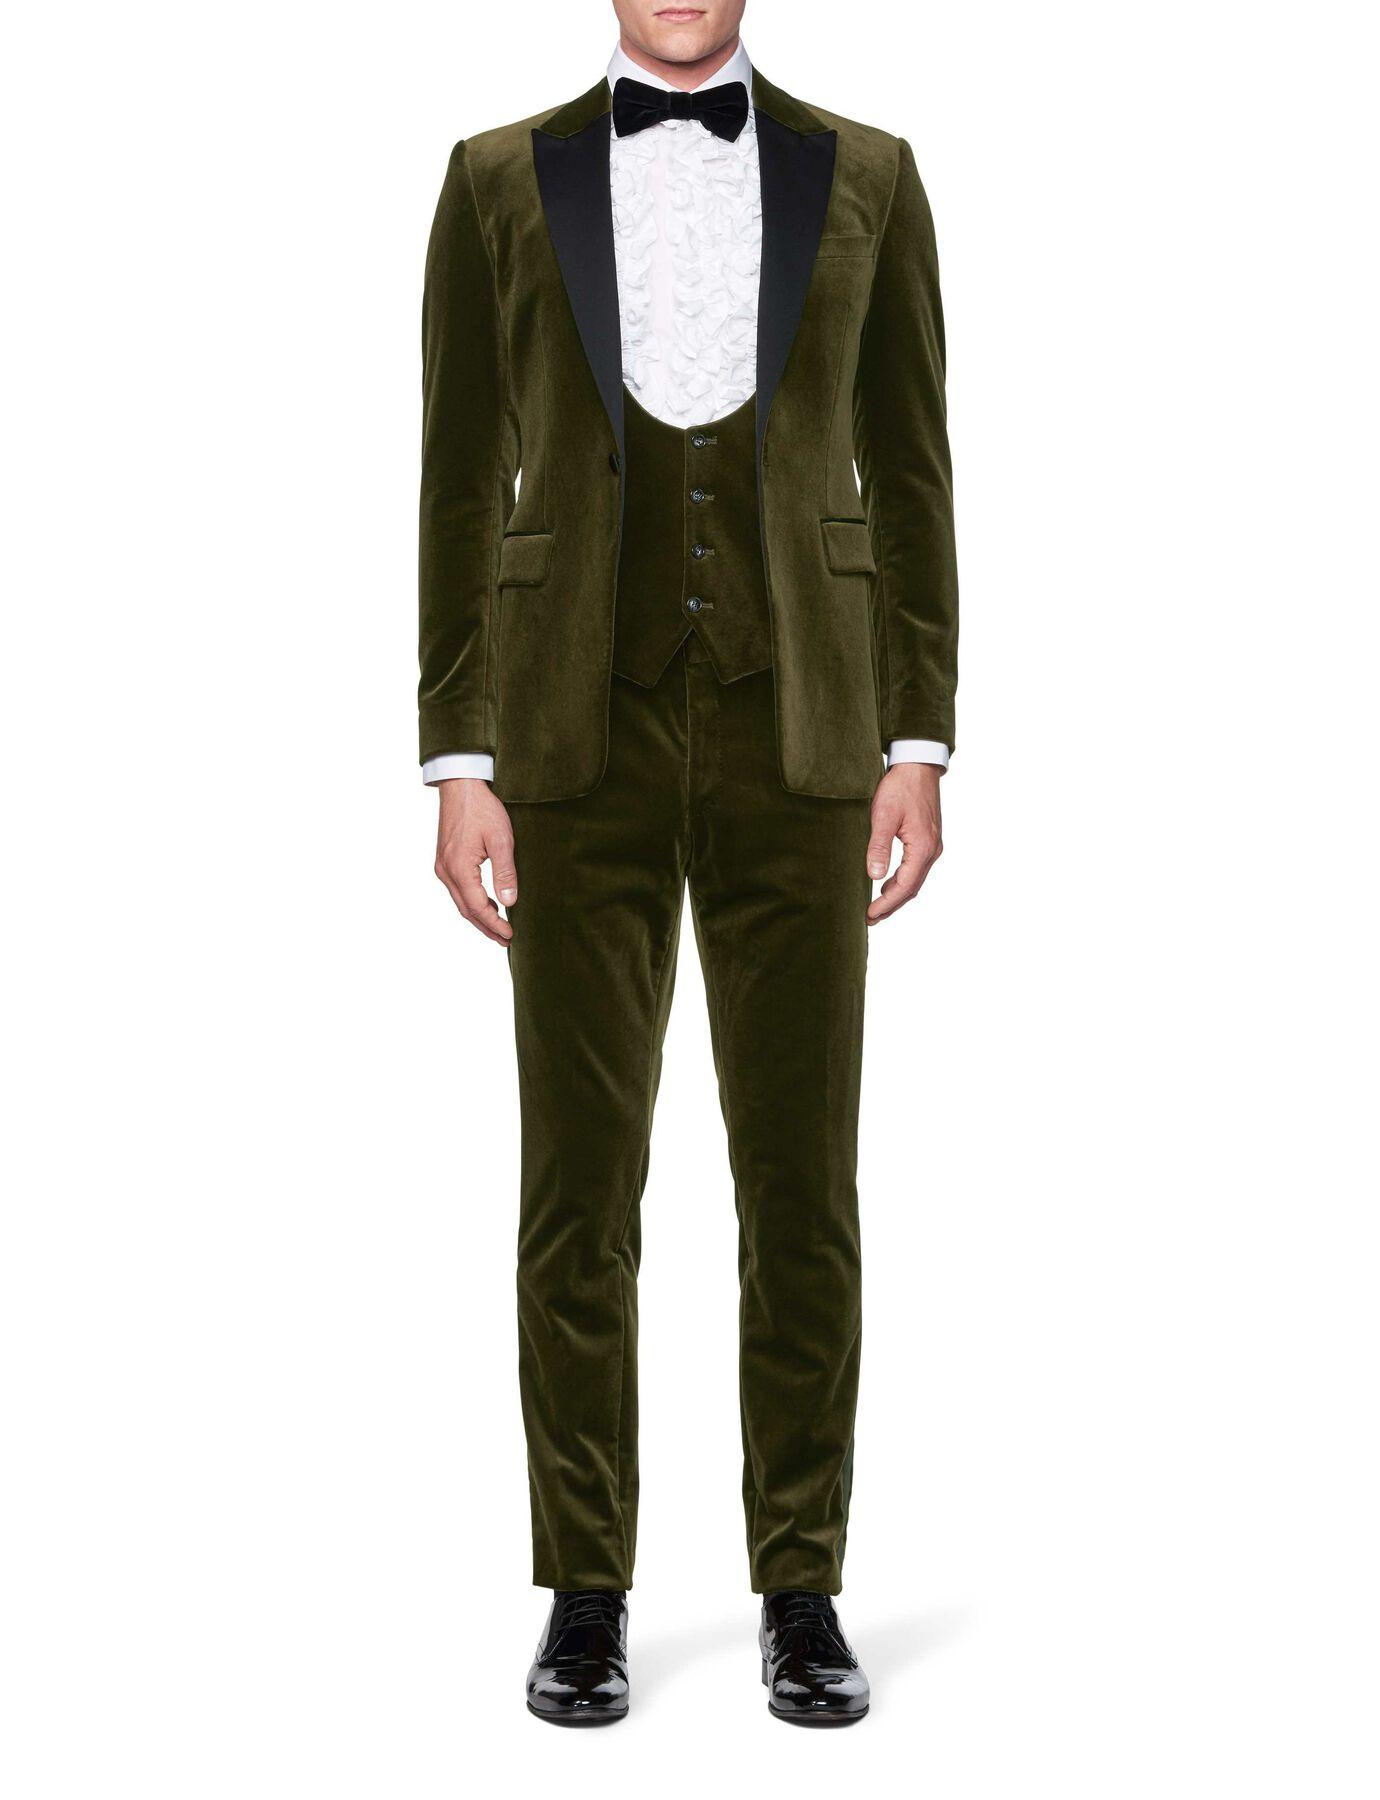 Digby waistcoat